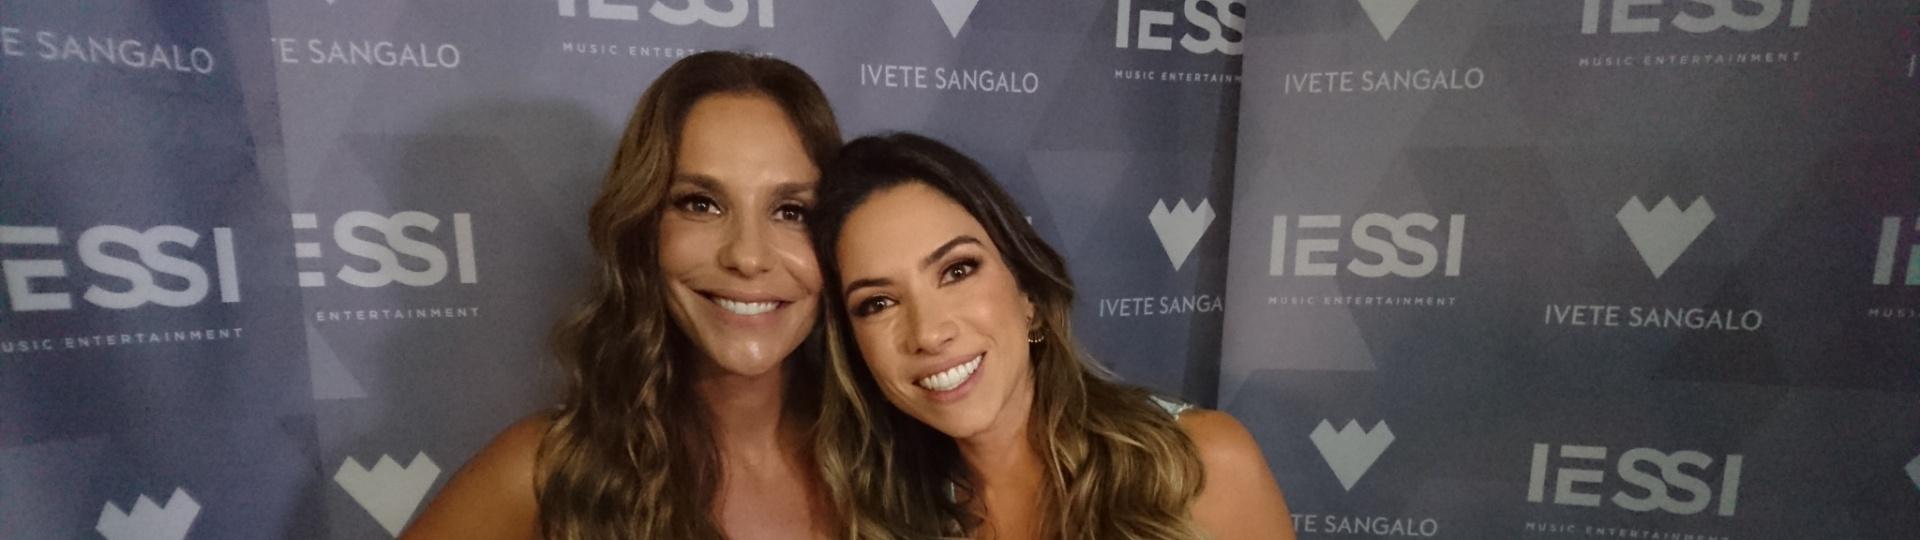 Ivete Sangalo e Patrícia Abravanel